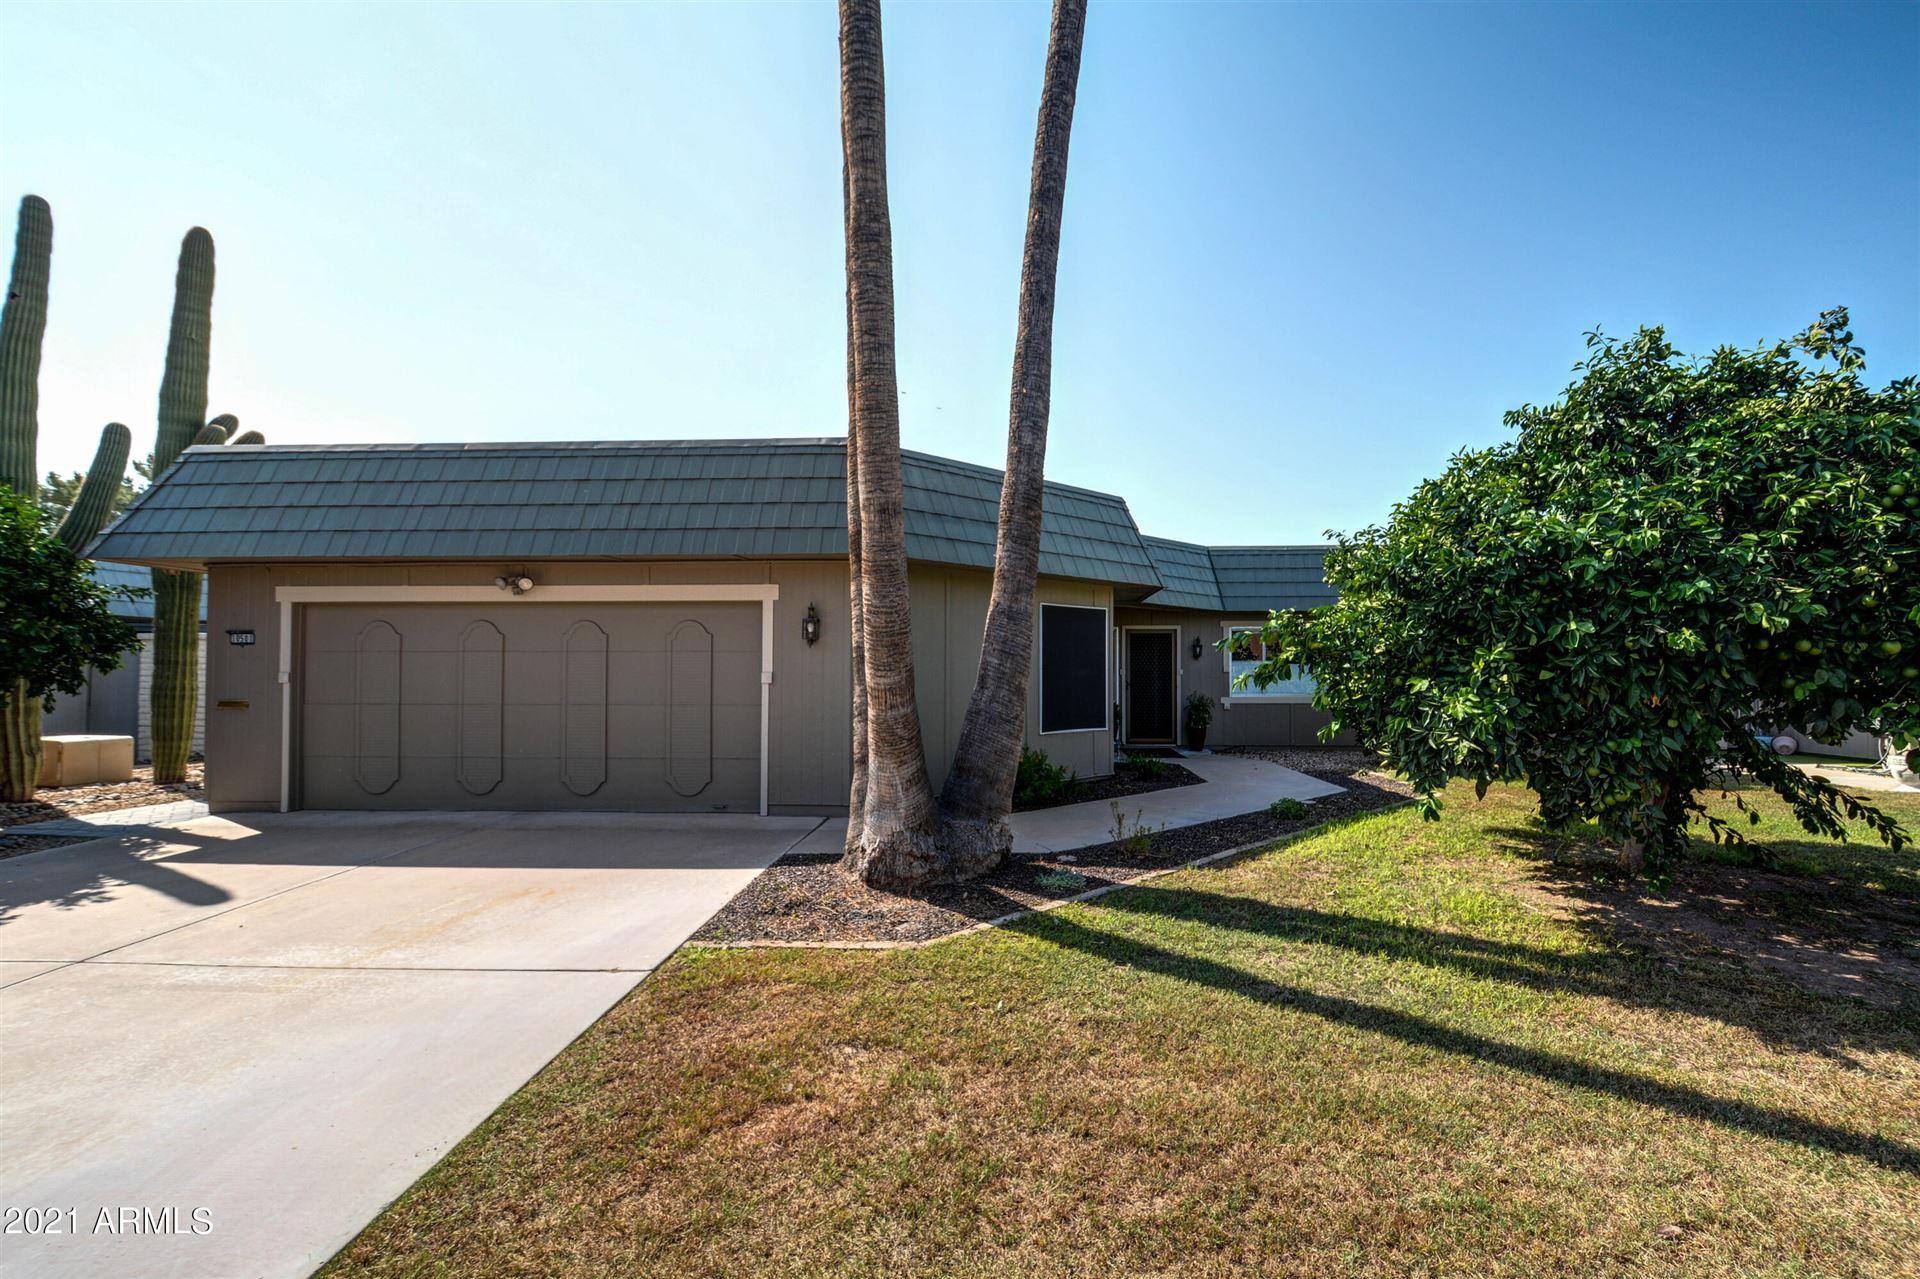 Photo of 10501 W CAMPANA Drive, Sun City, AZ 85351 (MLS # 6293786)